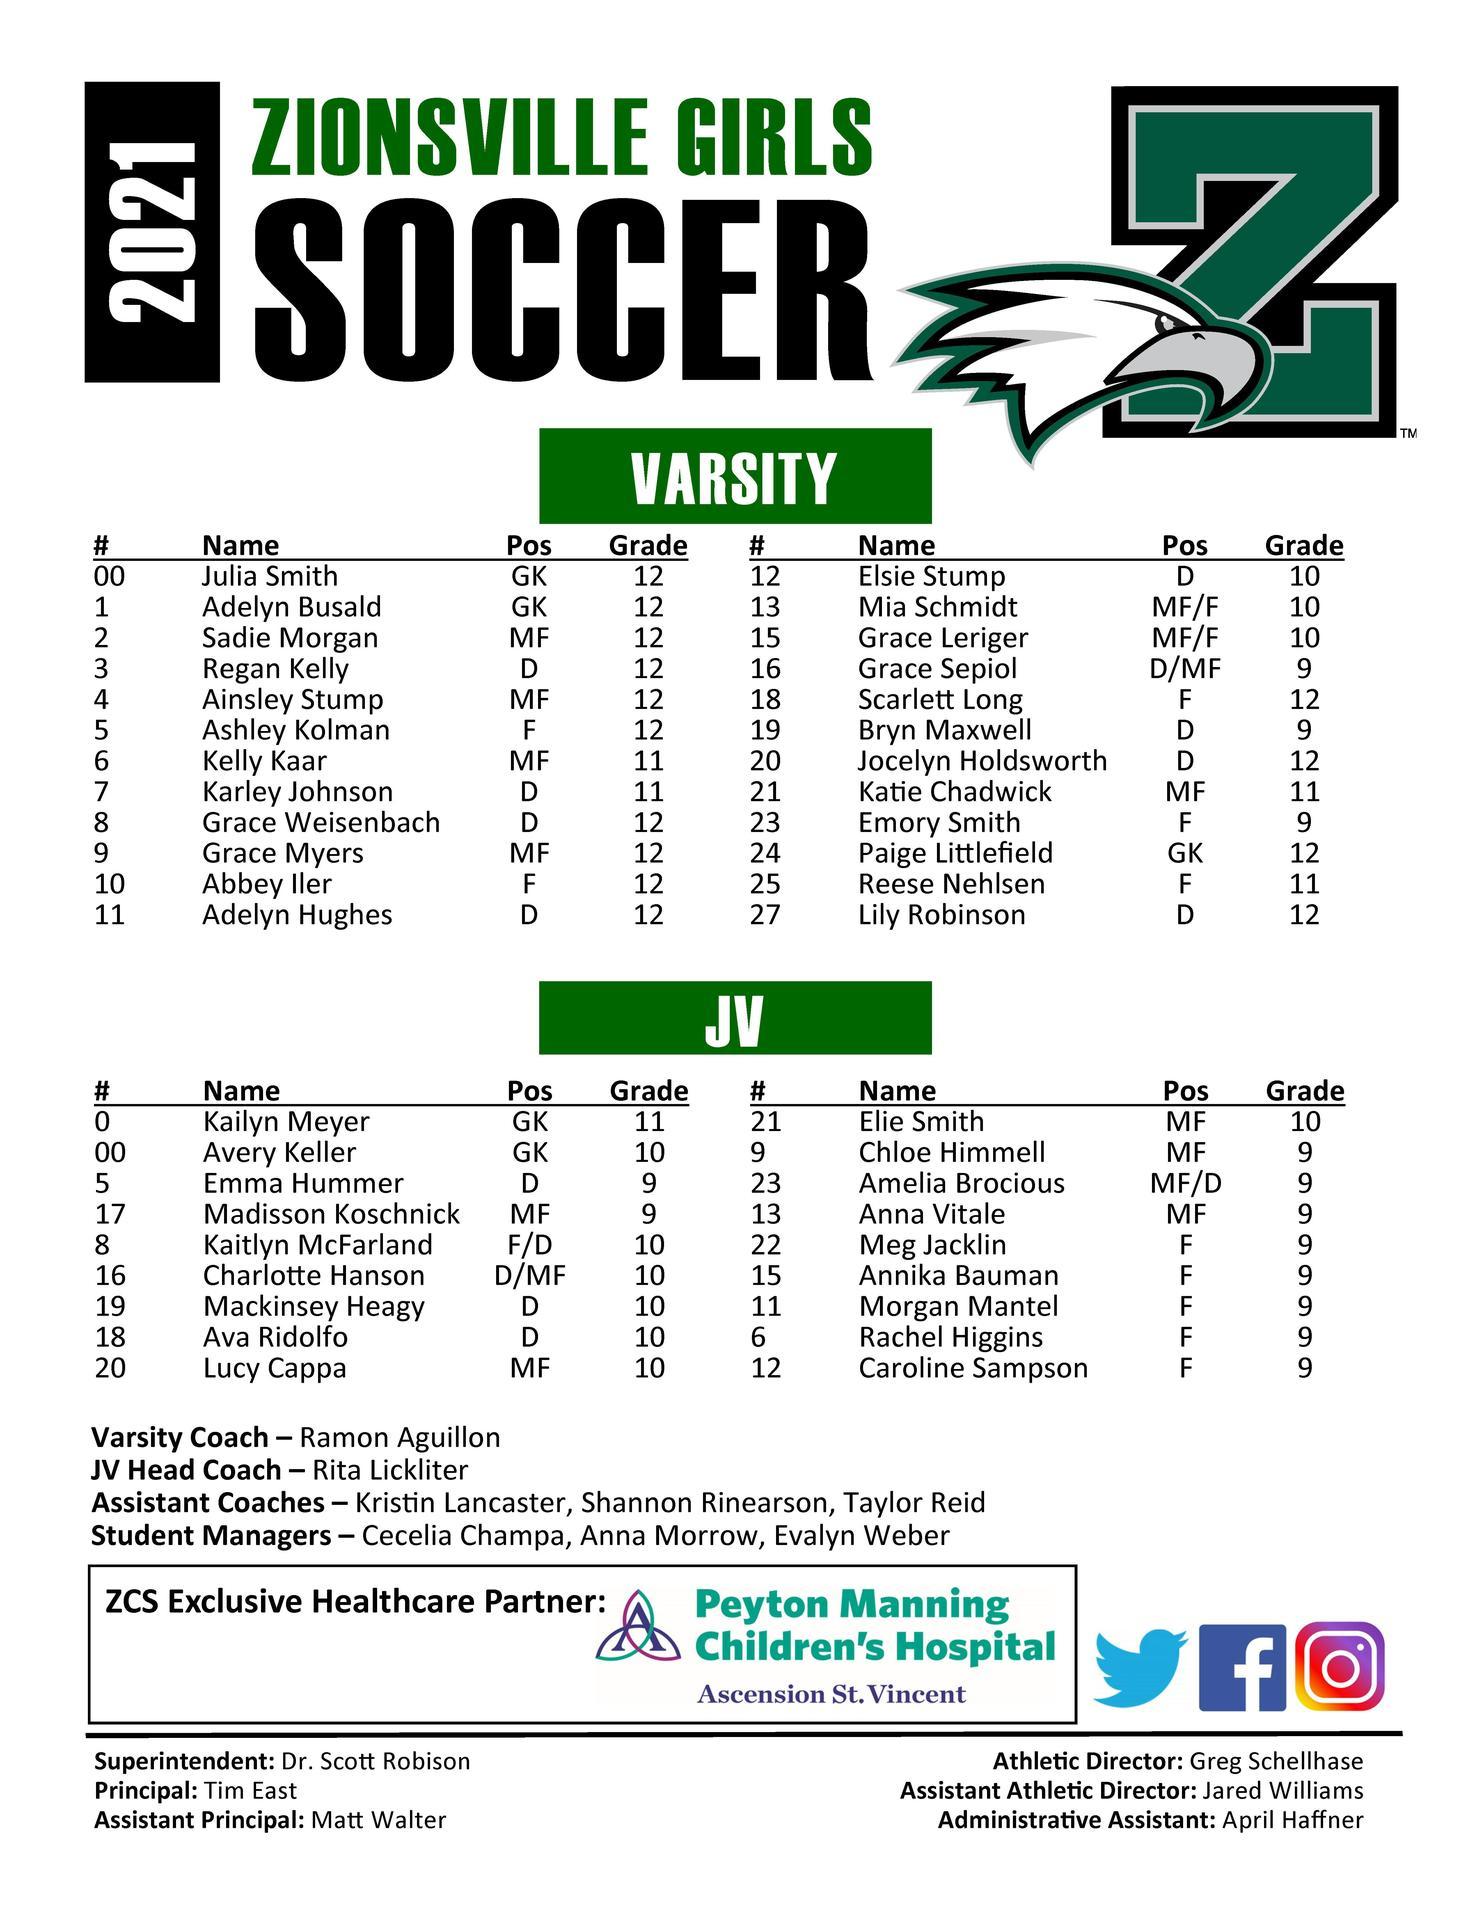 ZCHS Girls Soccer roster